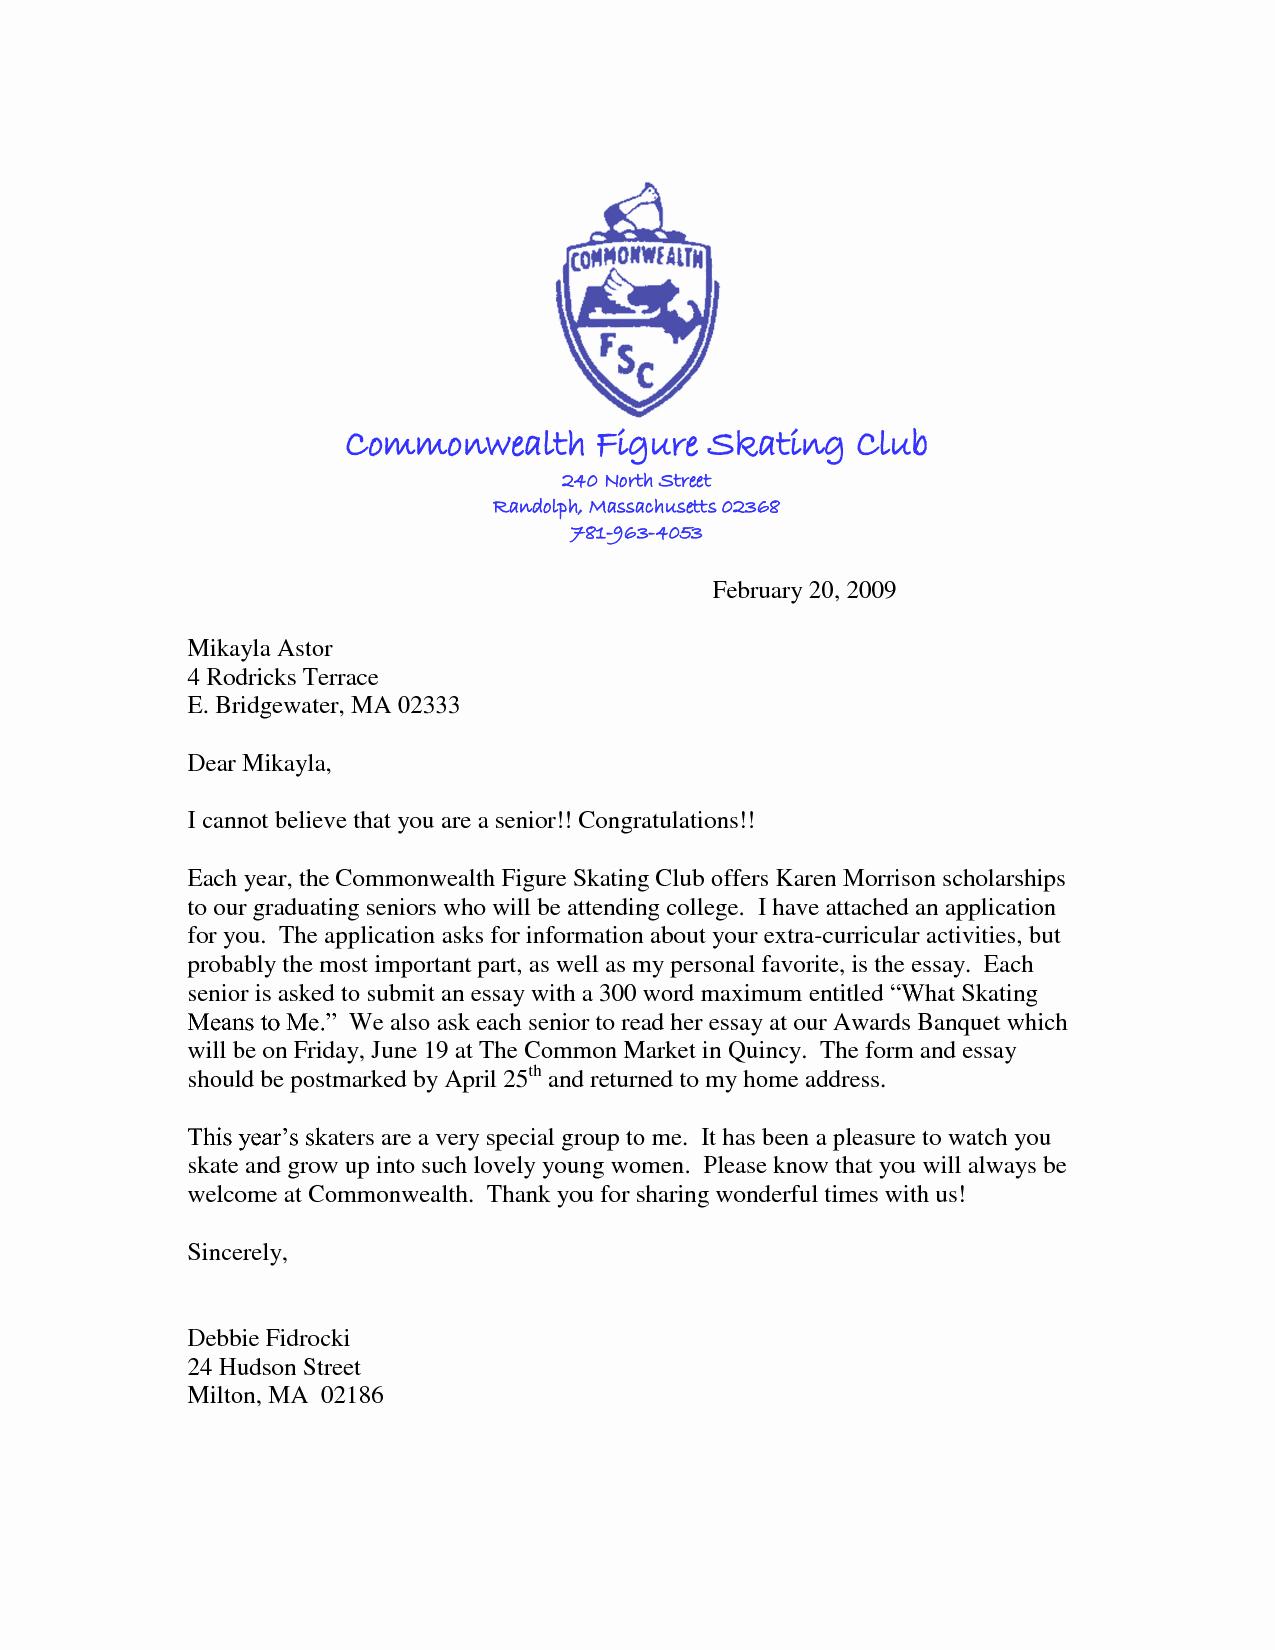 Cover Letter for Scholarship Unique Scholarship Application Cover Letter Sample Resume Template